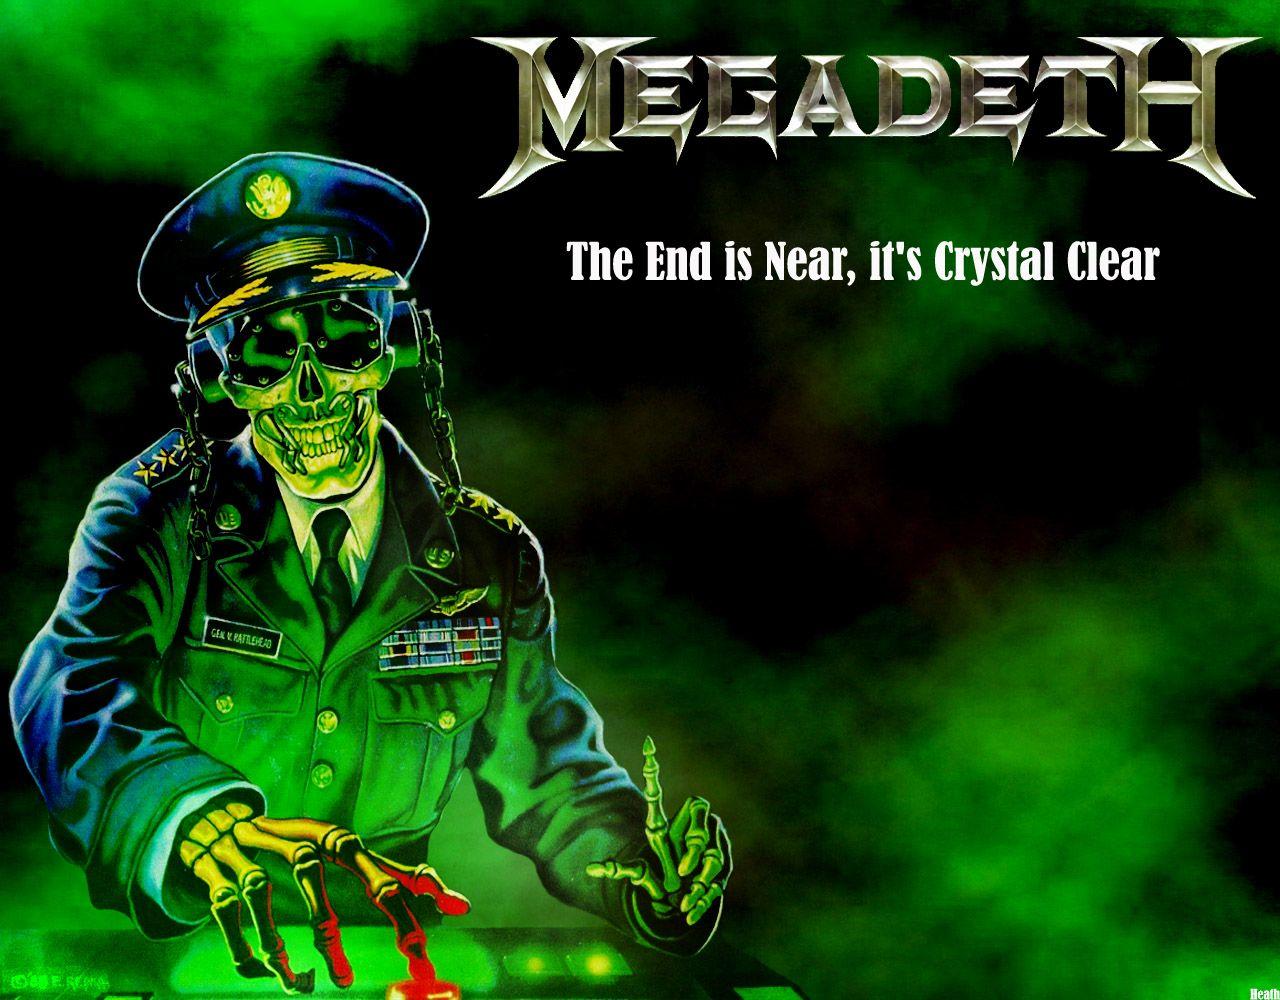 Megadeth Computer Wallpapers Desktop Backgrounds 1680x1050 Id 79729 Megadeth Computer Wallpaper Pics